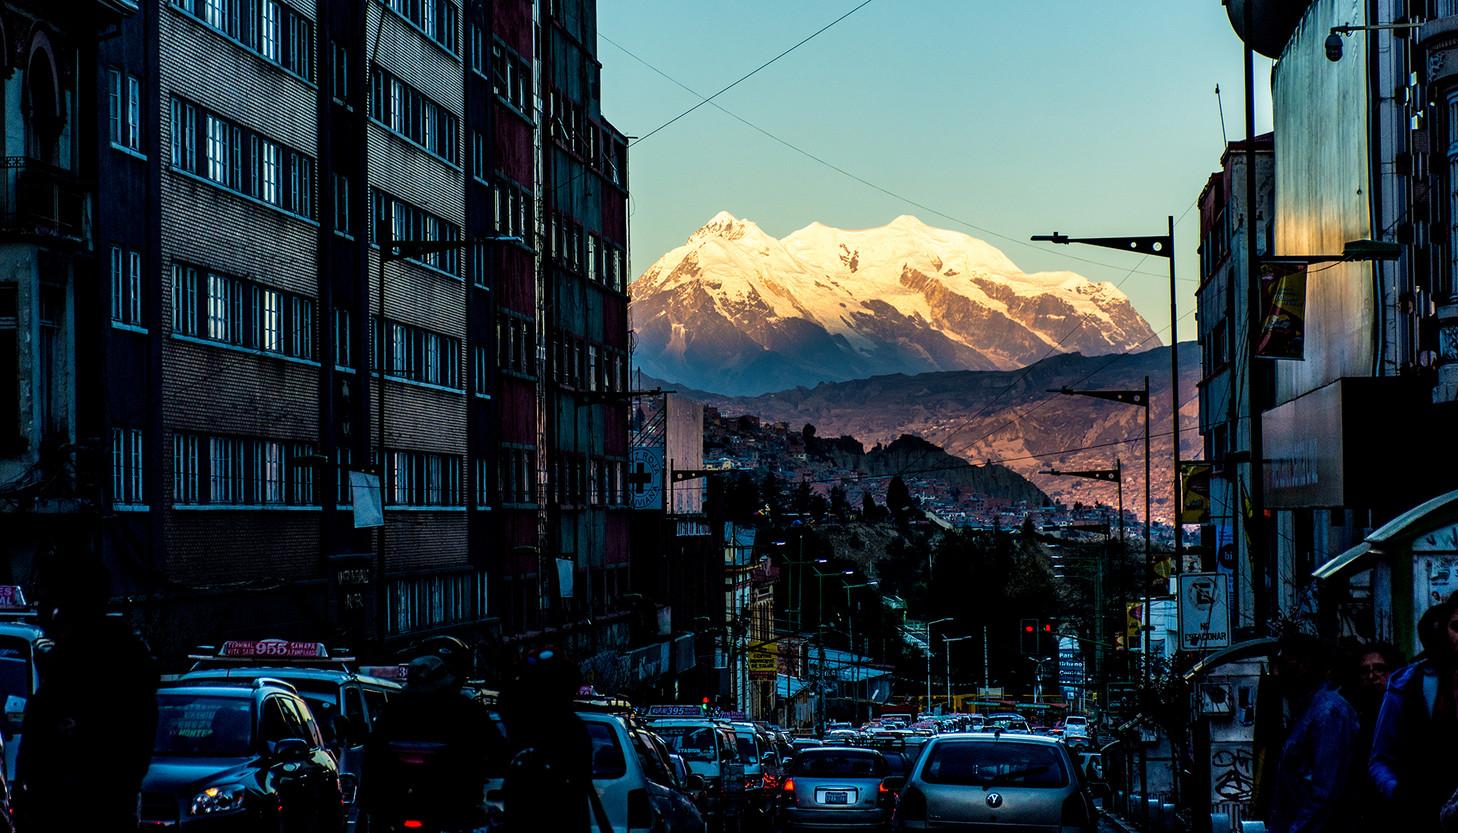 LaPaz_[Landscape]_-_Copyright_©_2018_And